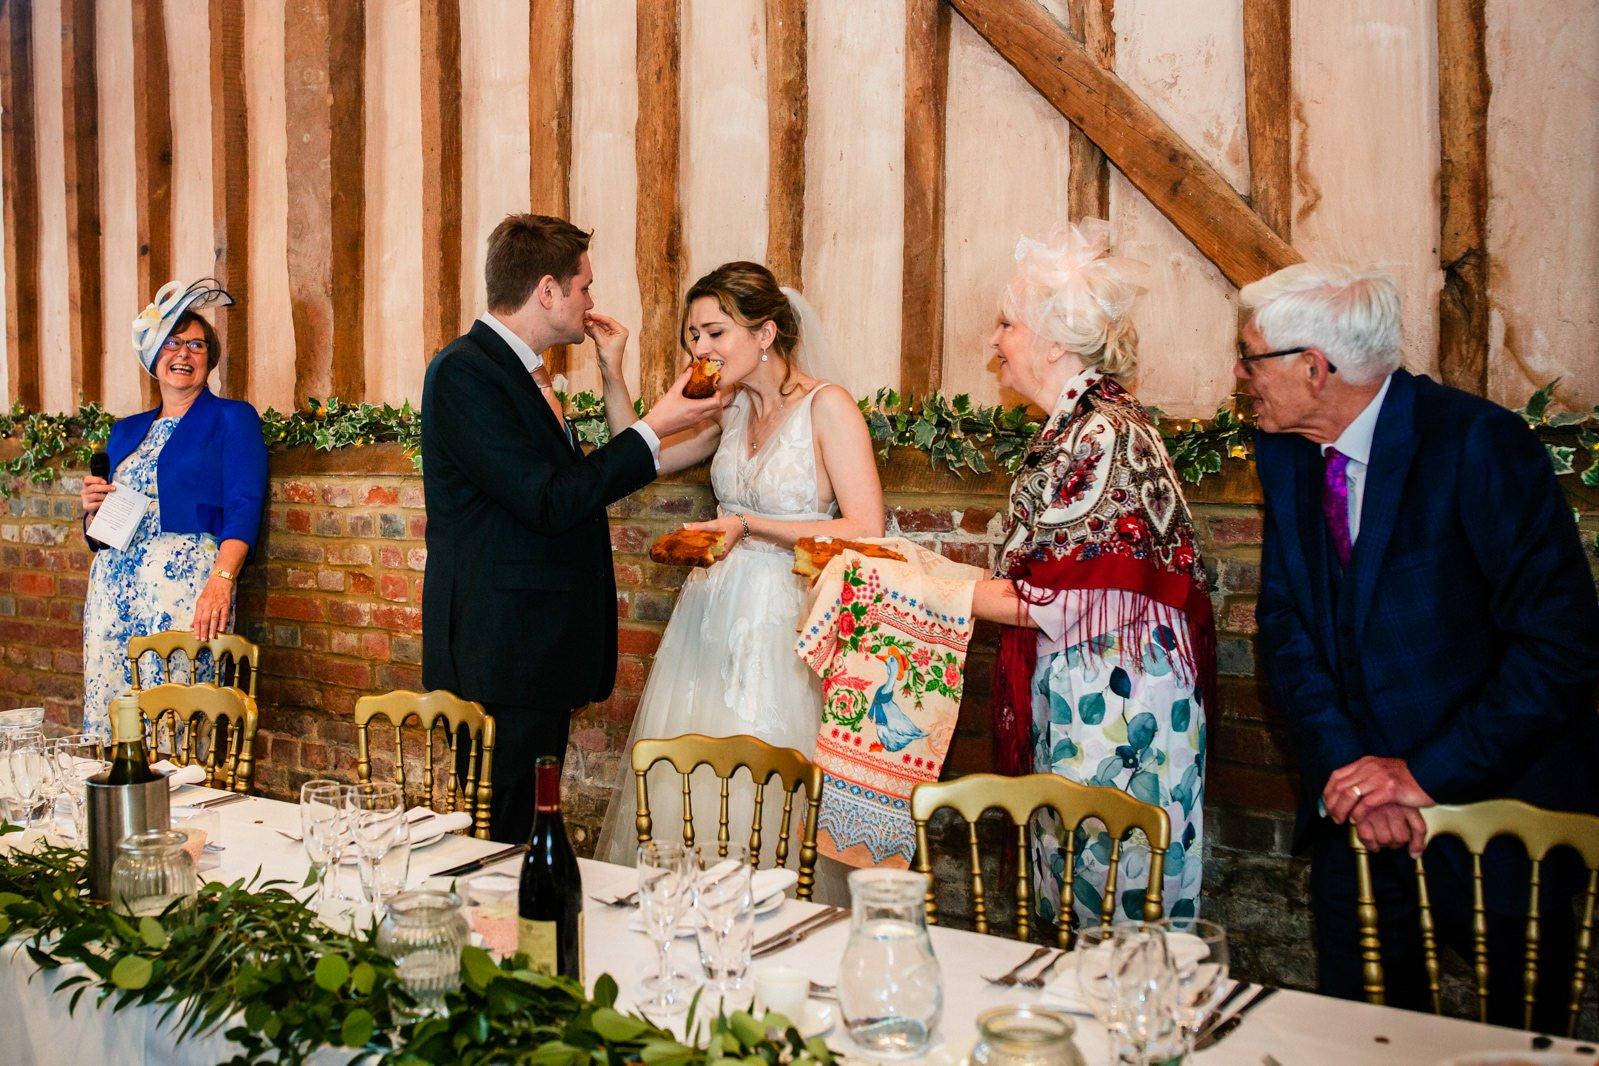 Beautiful Lillibrooke Manor Wedding - Ksenia & Iain 140